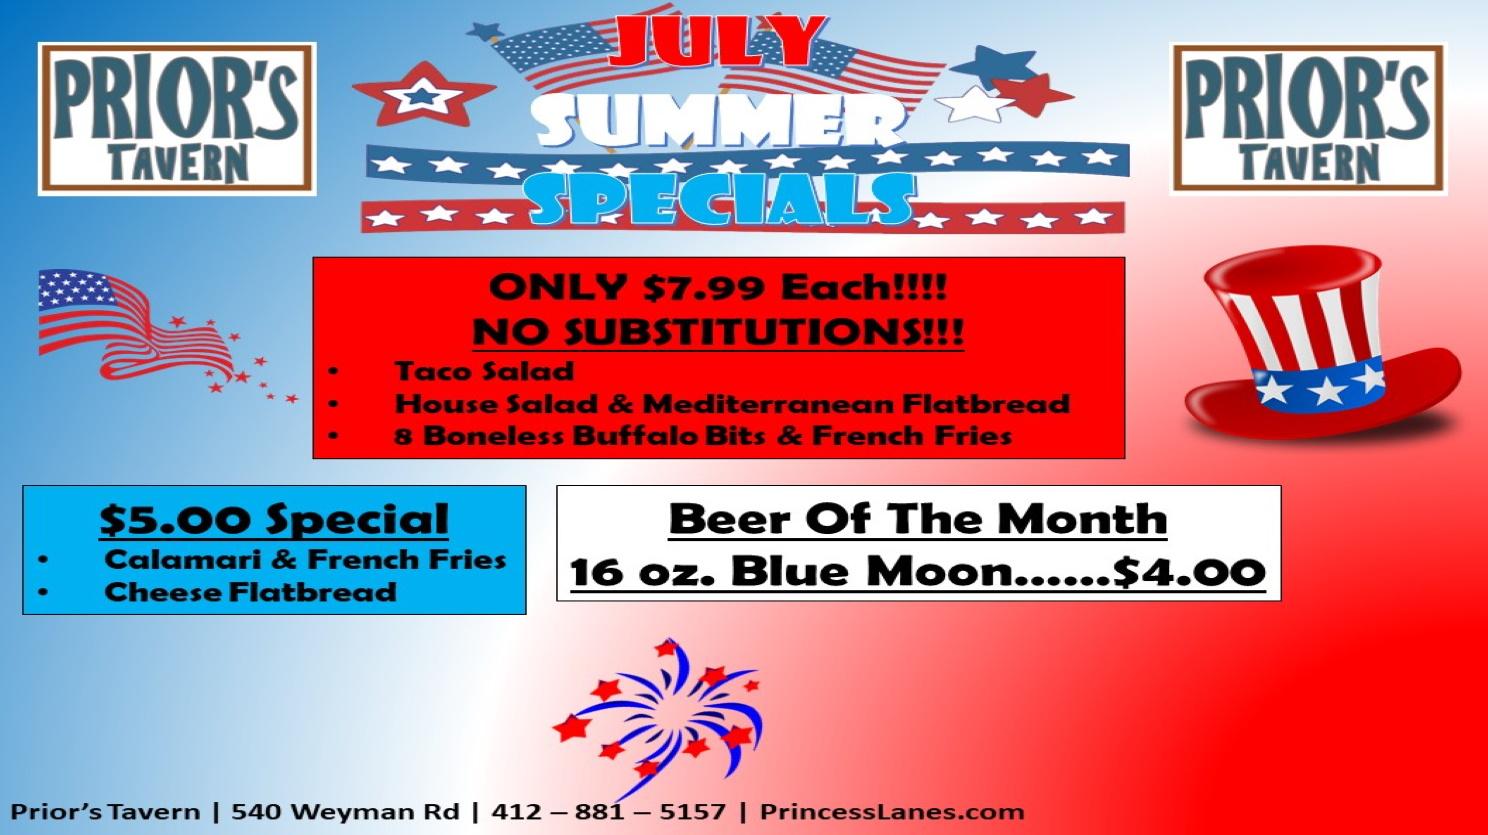 July Summer Special at Prior's Tavern